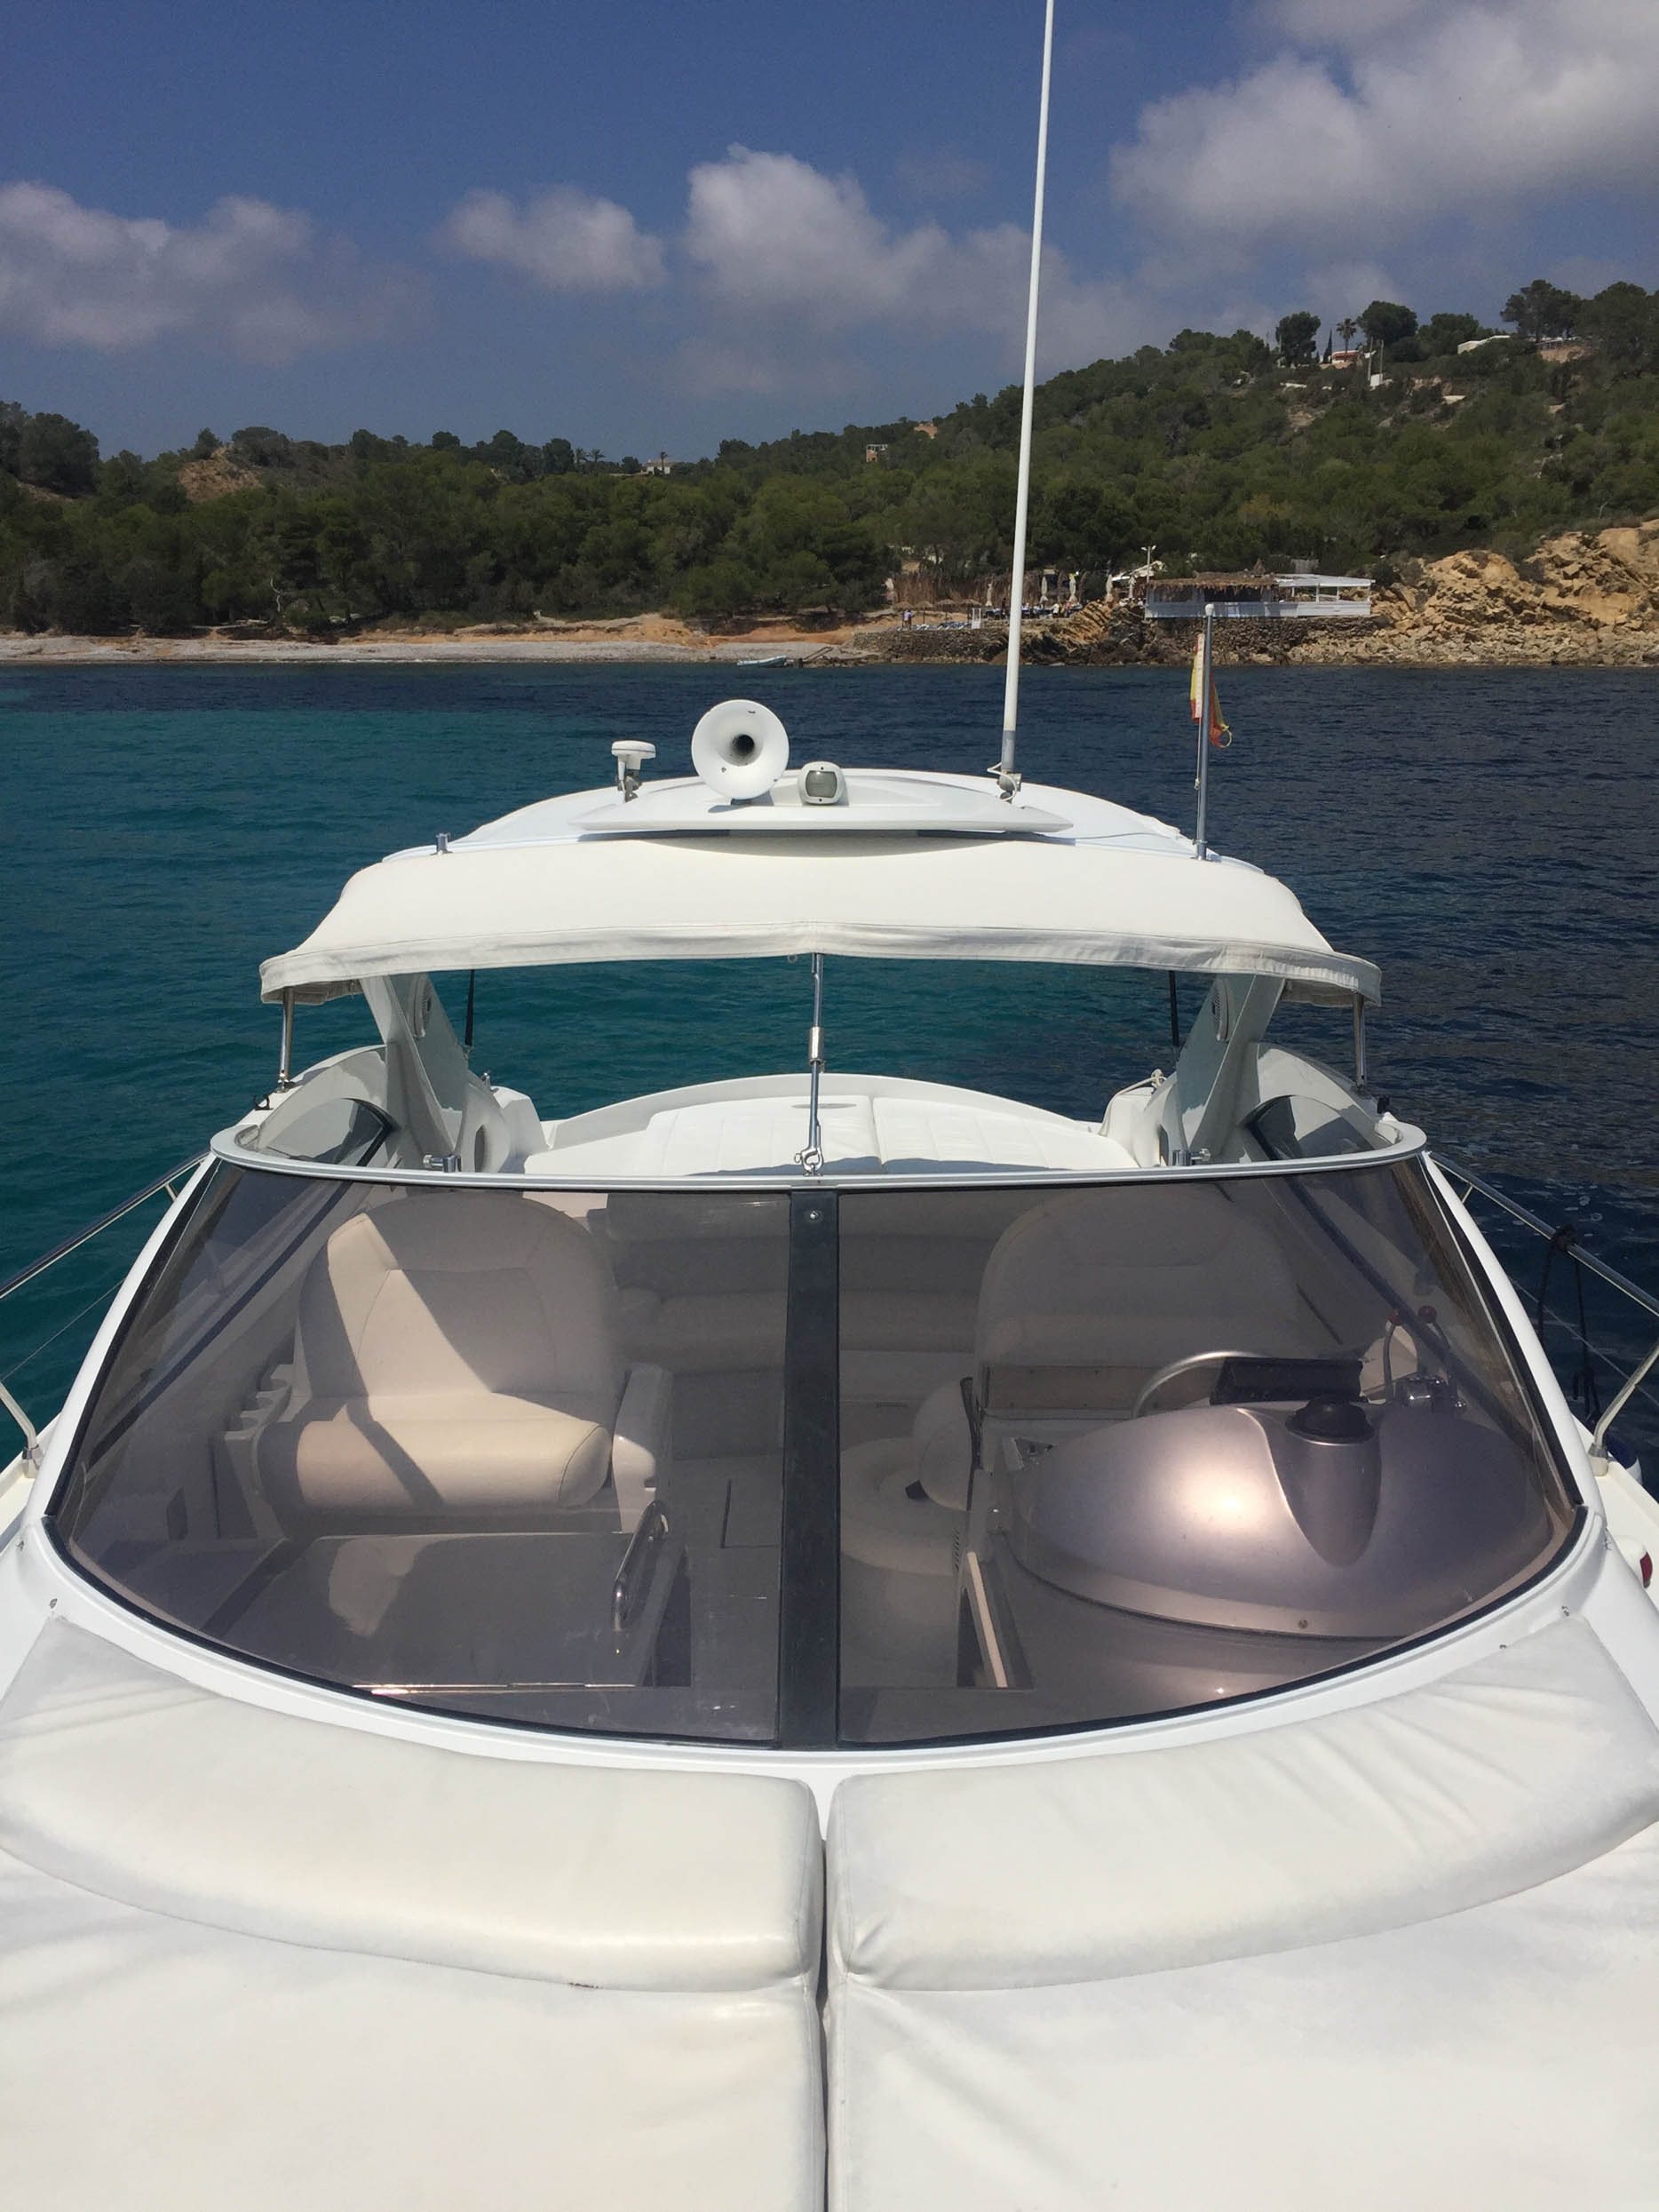 Aura-Ibiza-Boats-2018-008.jpg